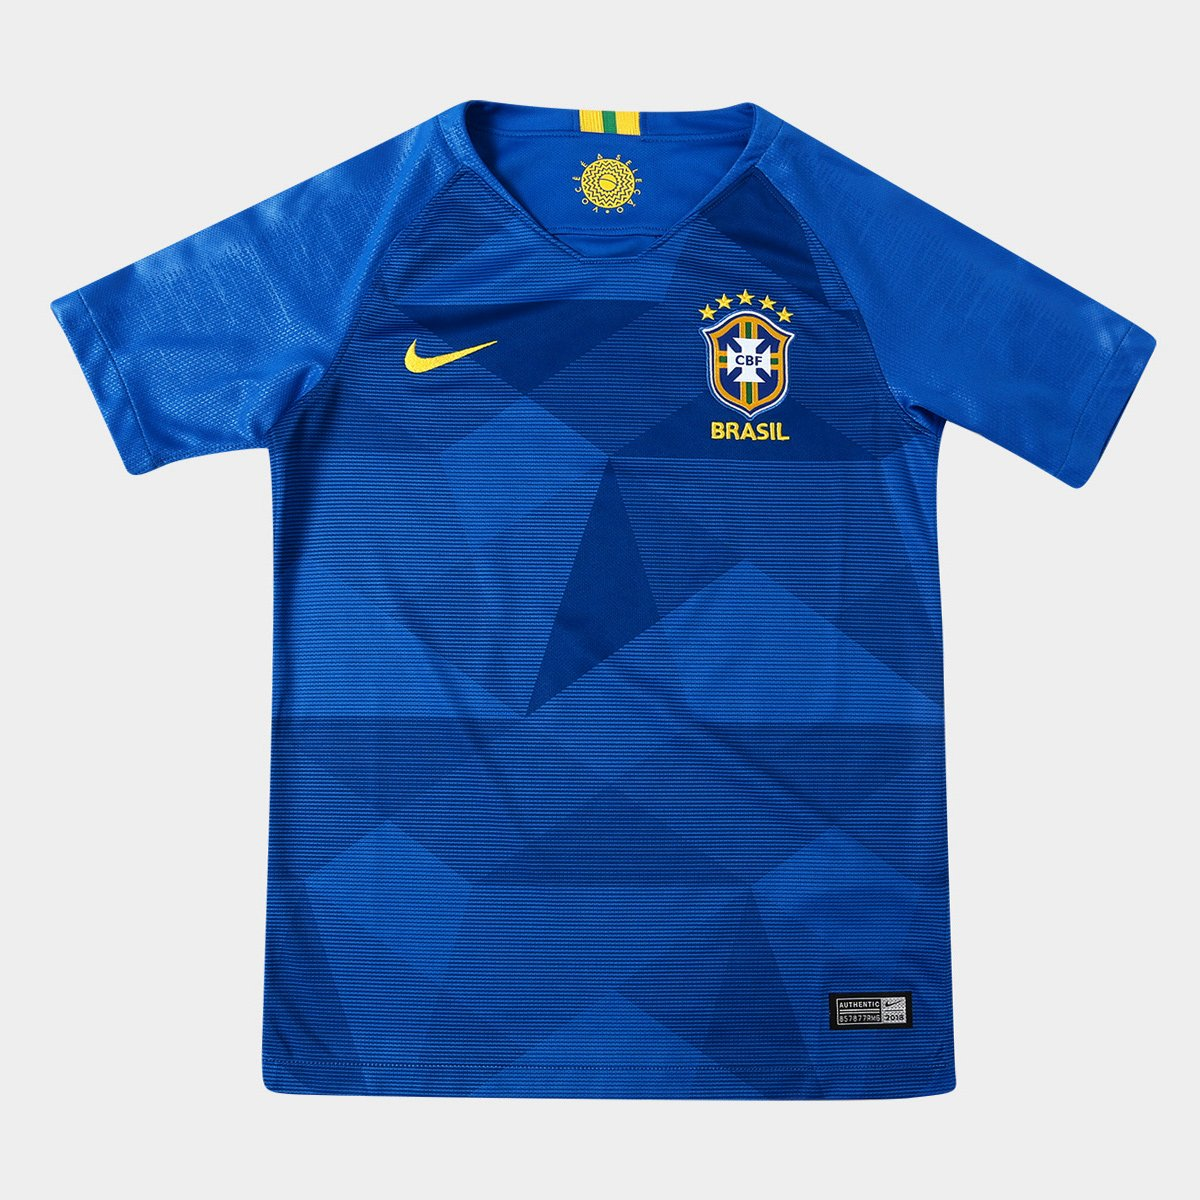 0cdbefc16b Camisa Seleção Brasil Juvenil II 2018 s n° - Torcedor Nike - Compre ...